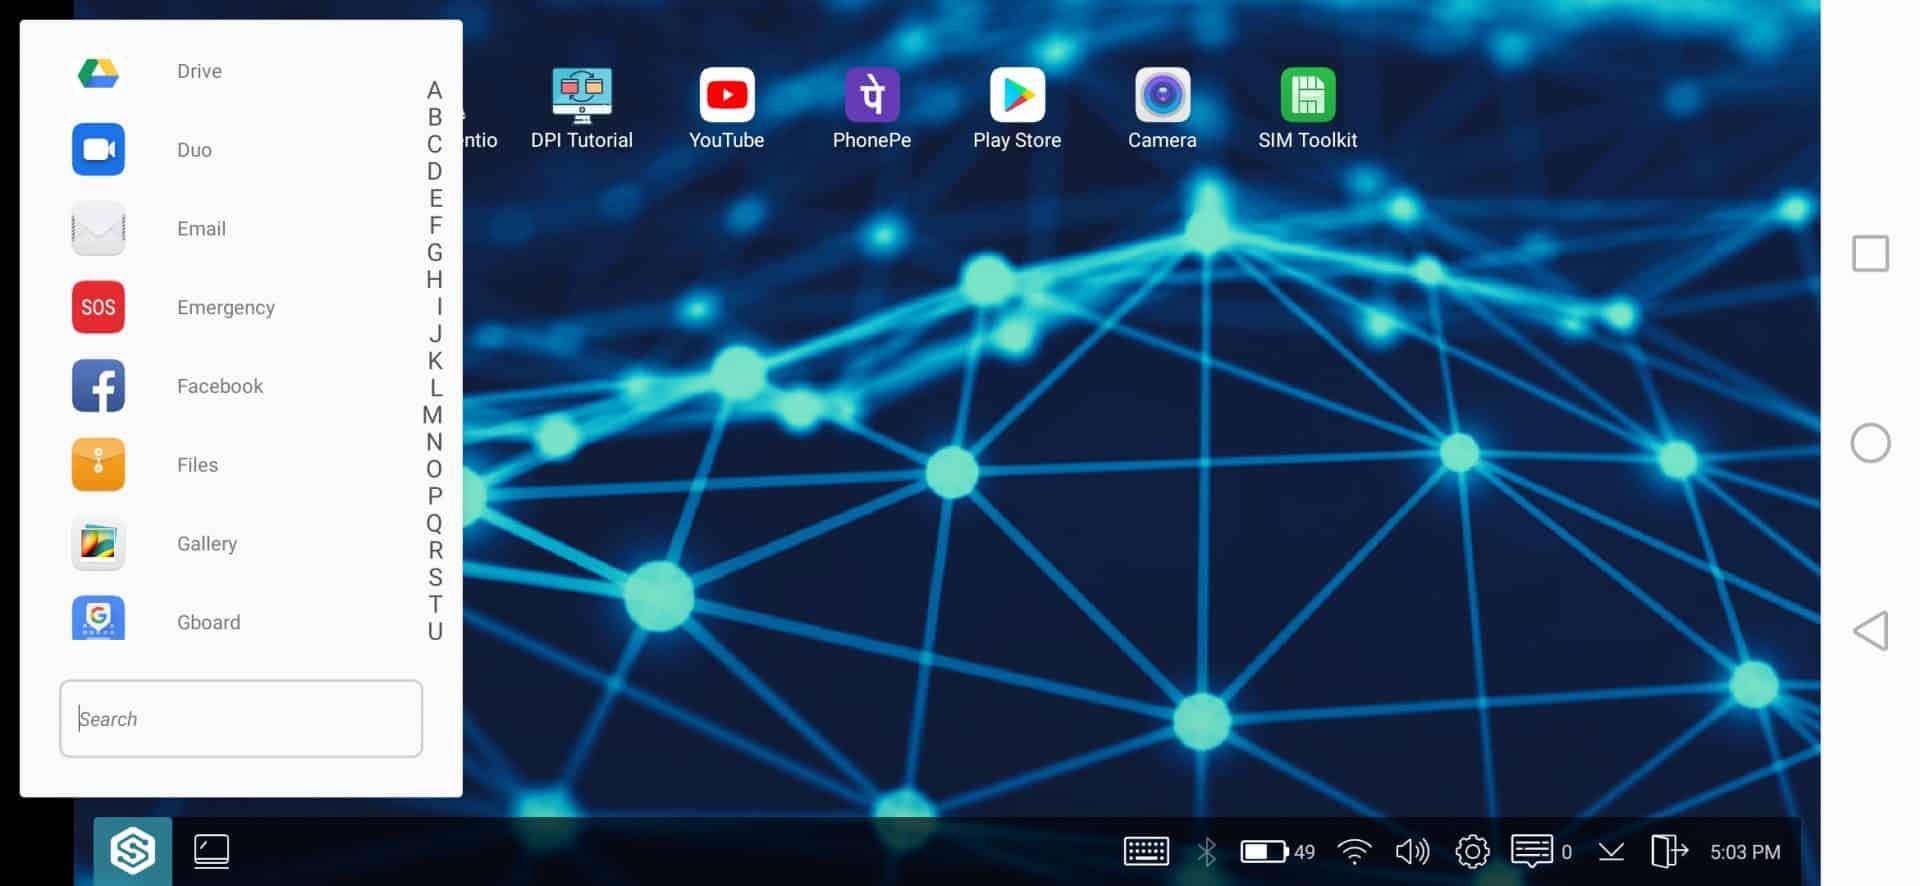 Using Sentio Desktop